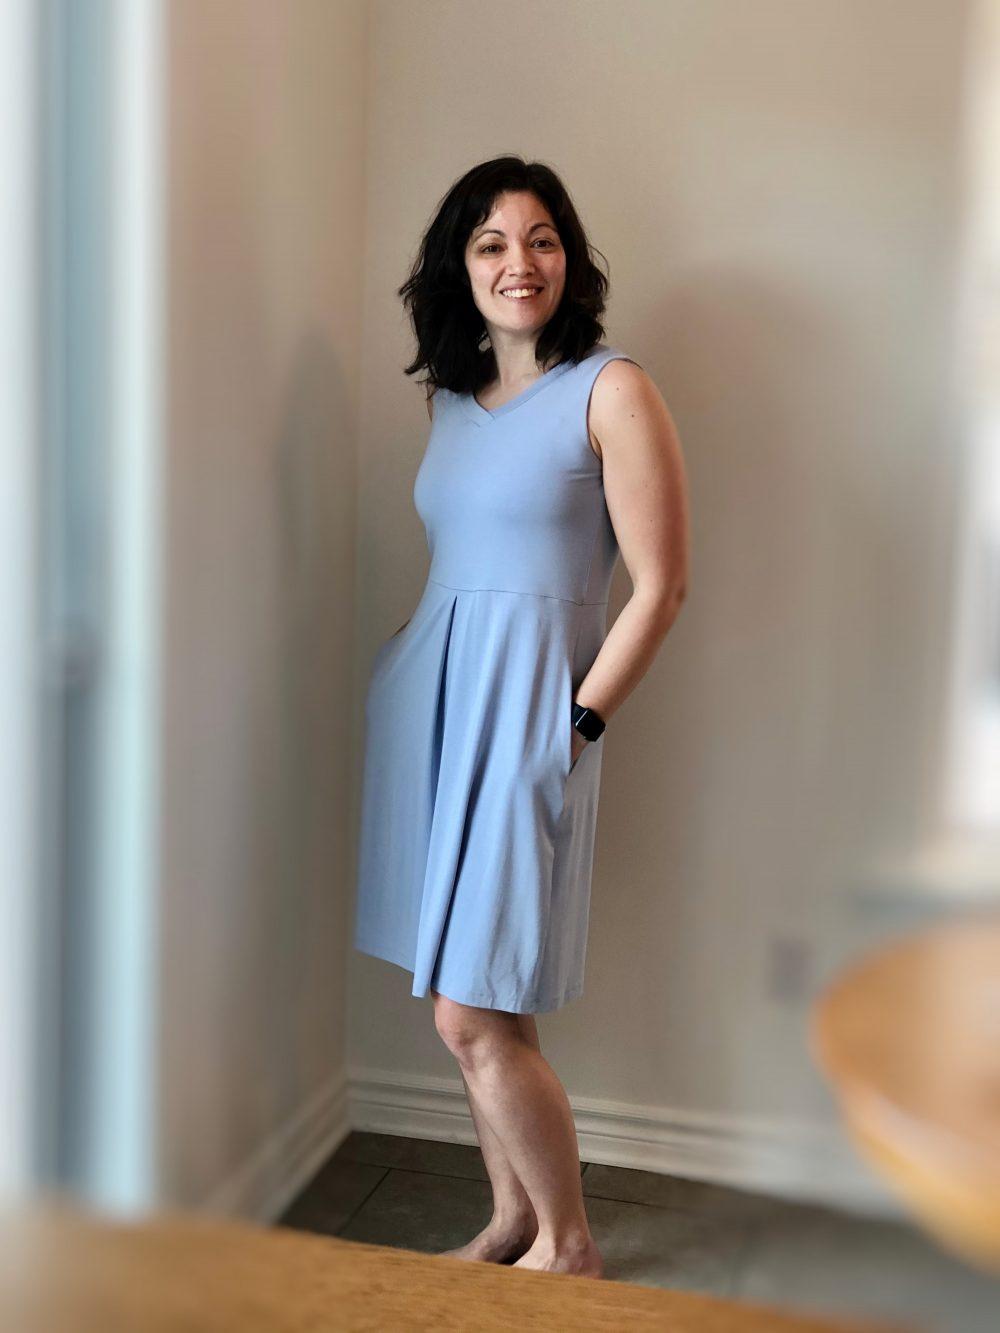 Carolyn Reversible Sundress in Silky Blue, V-Neck in Front